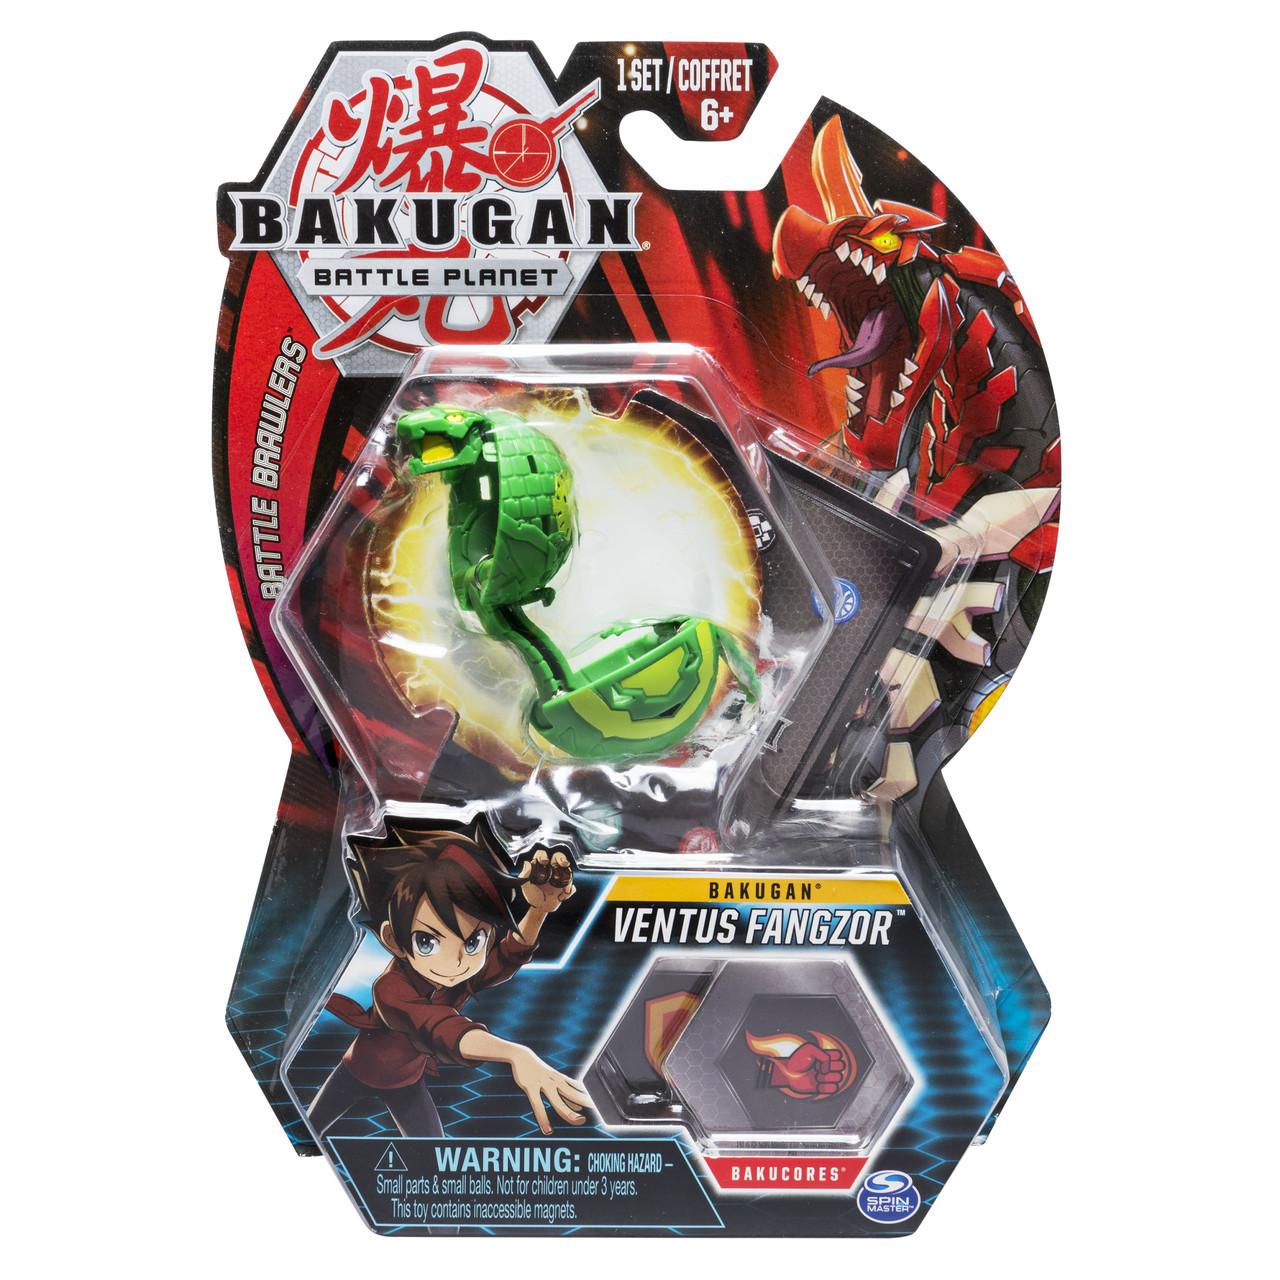 Бакуган Вентус Фангзор Bakugan Battle planet Ventus Fangzor Spin Master оригинал